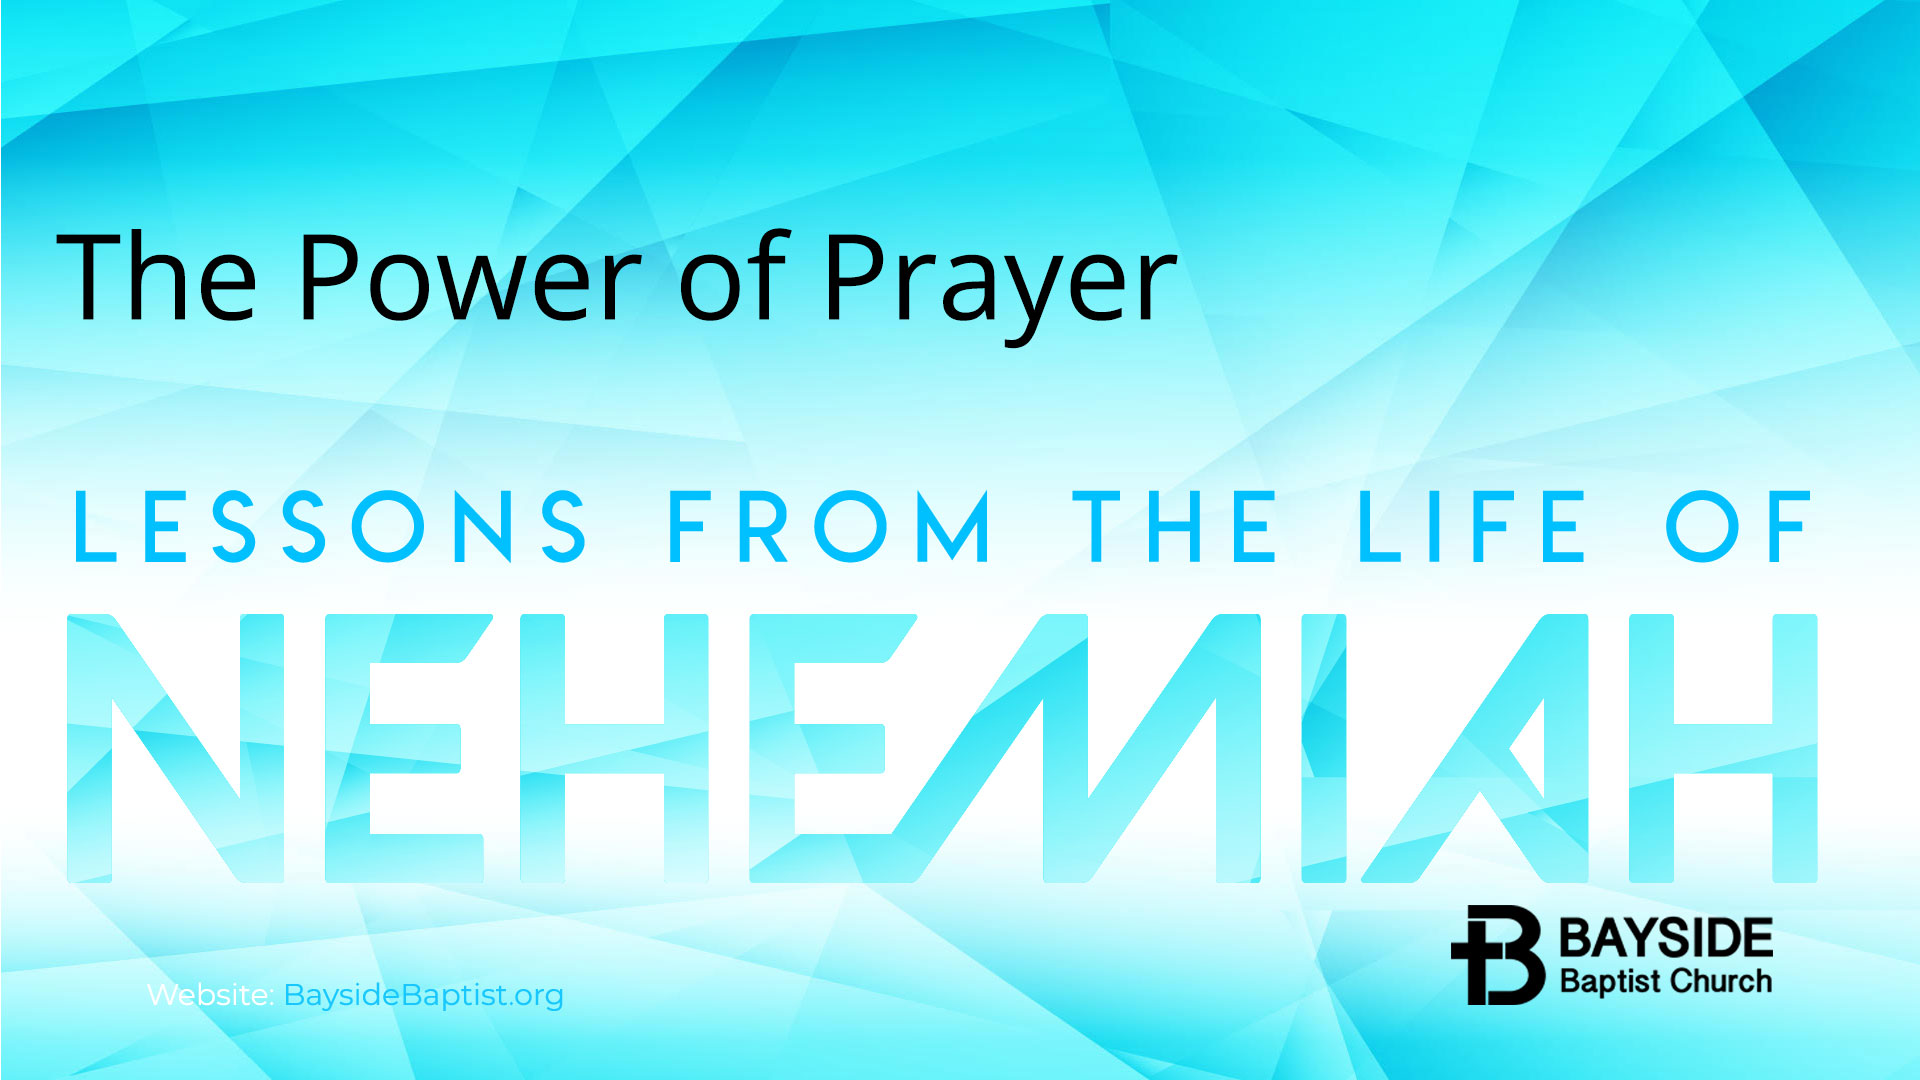 The Power of Prayer Image